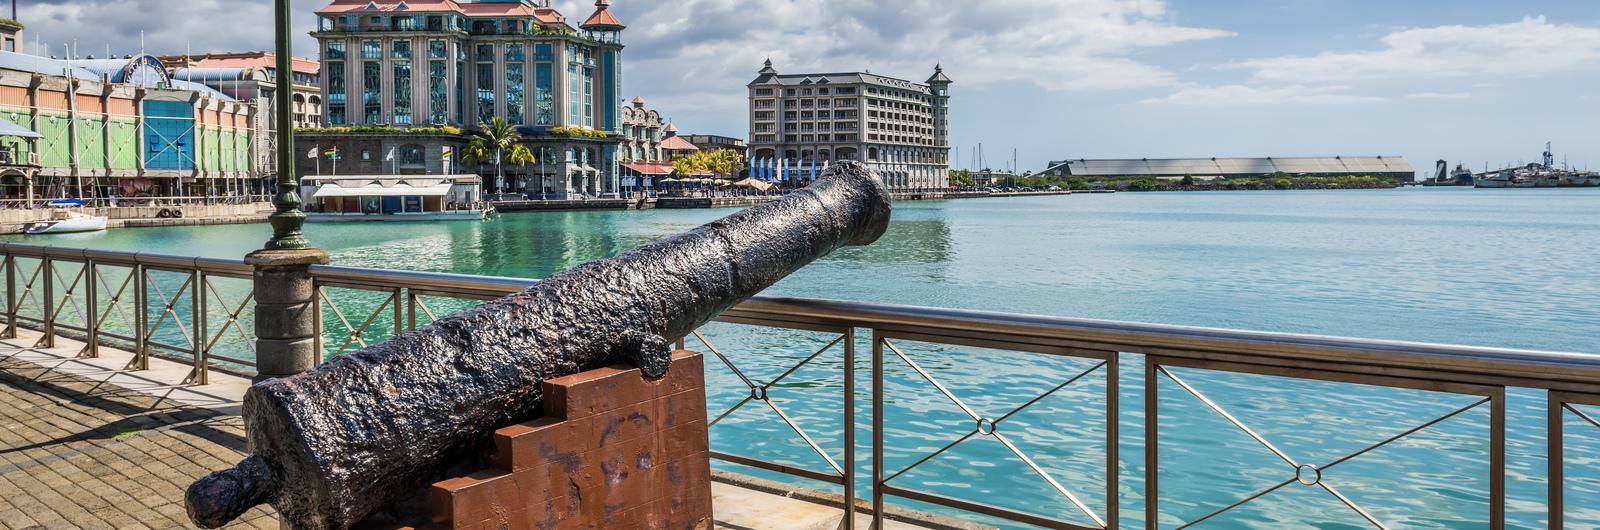 port louis city header